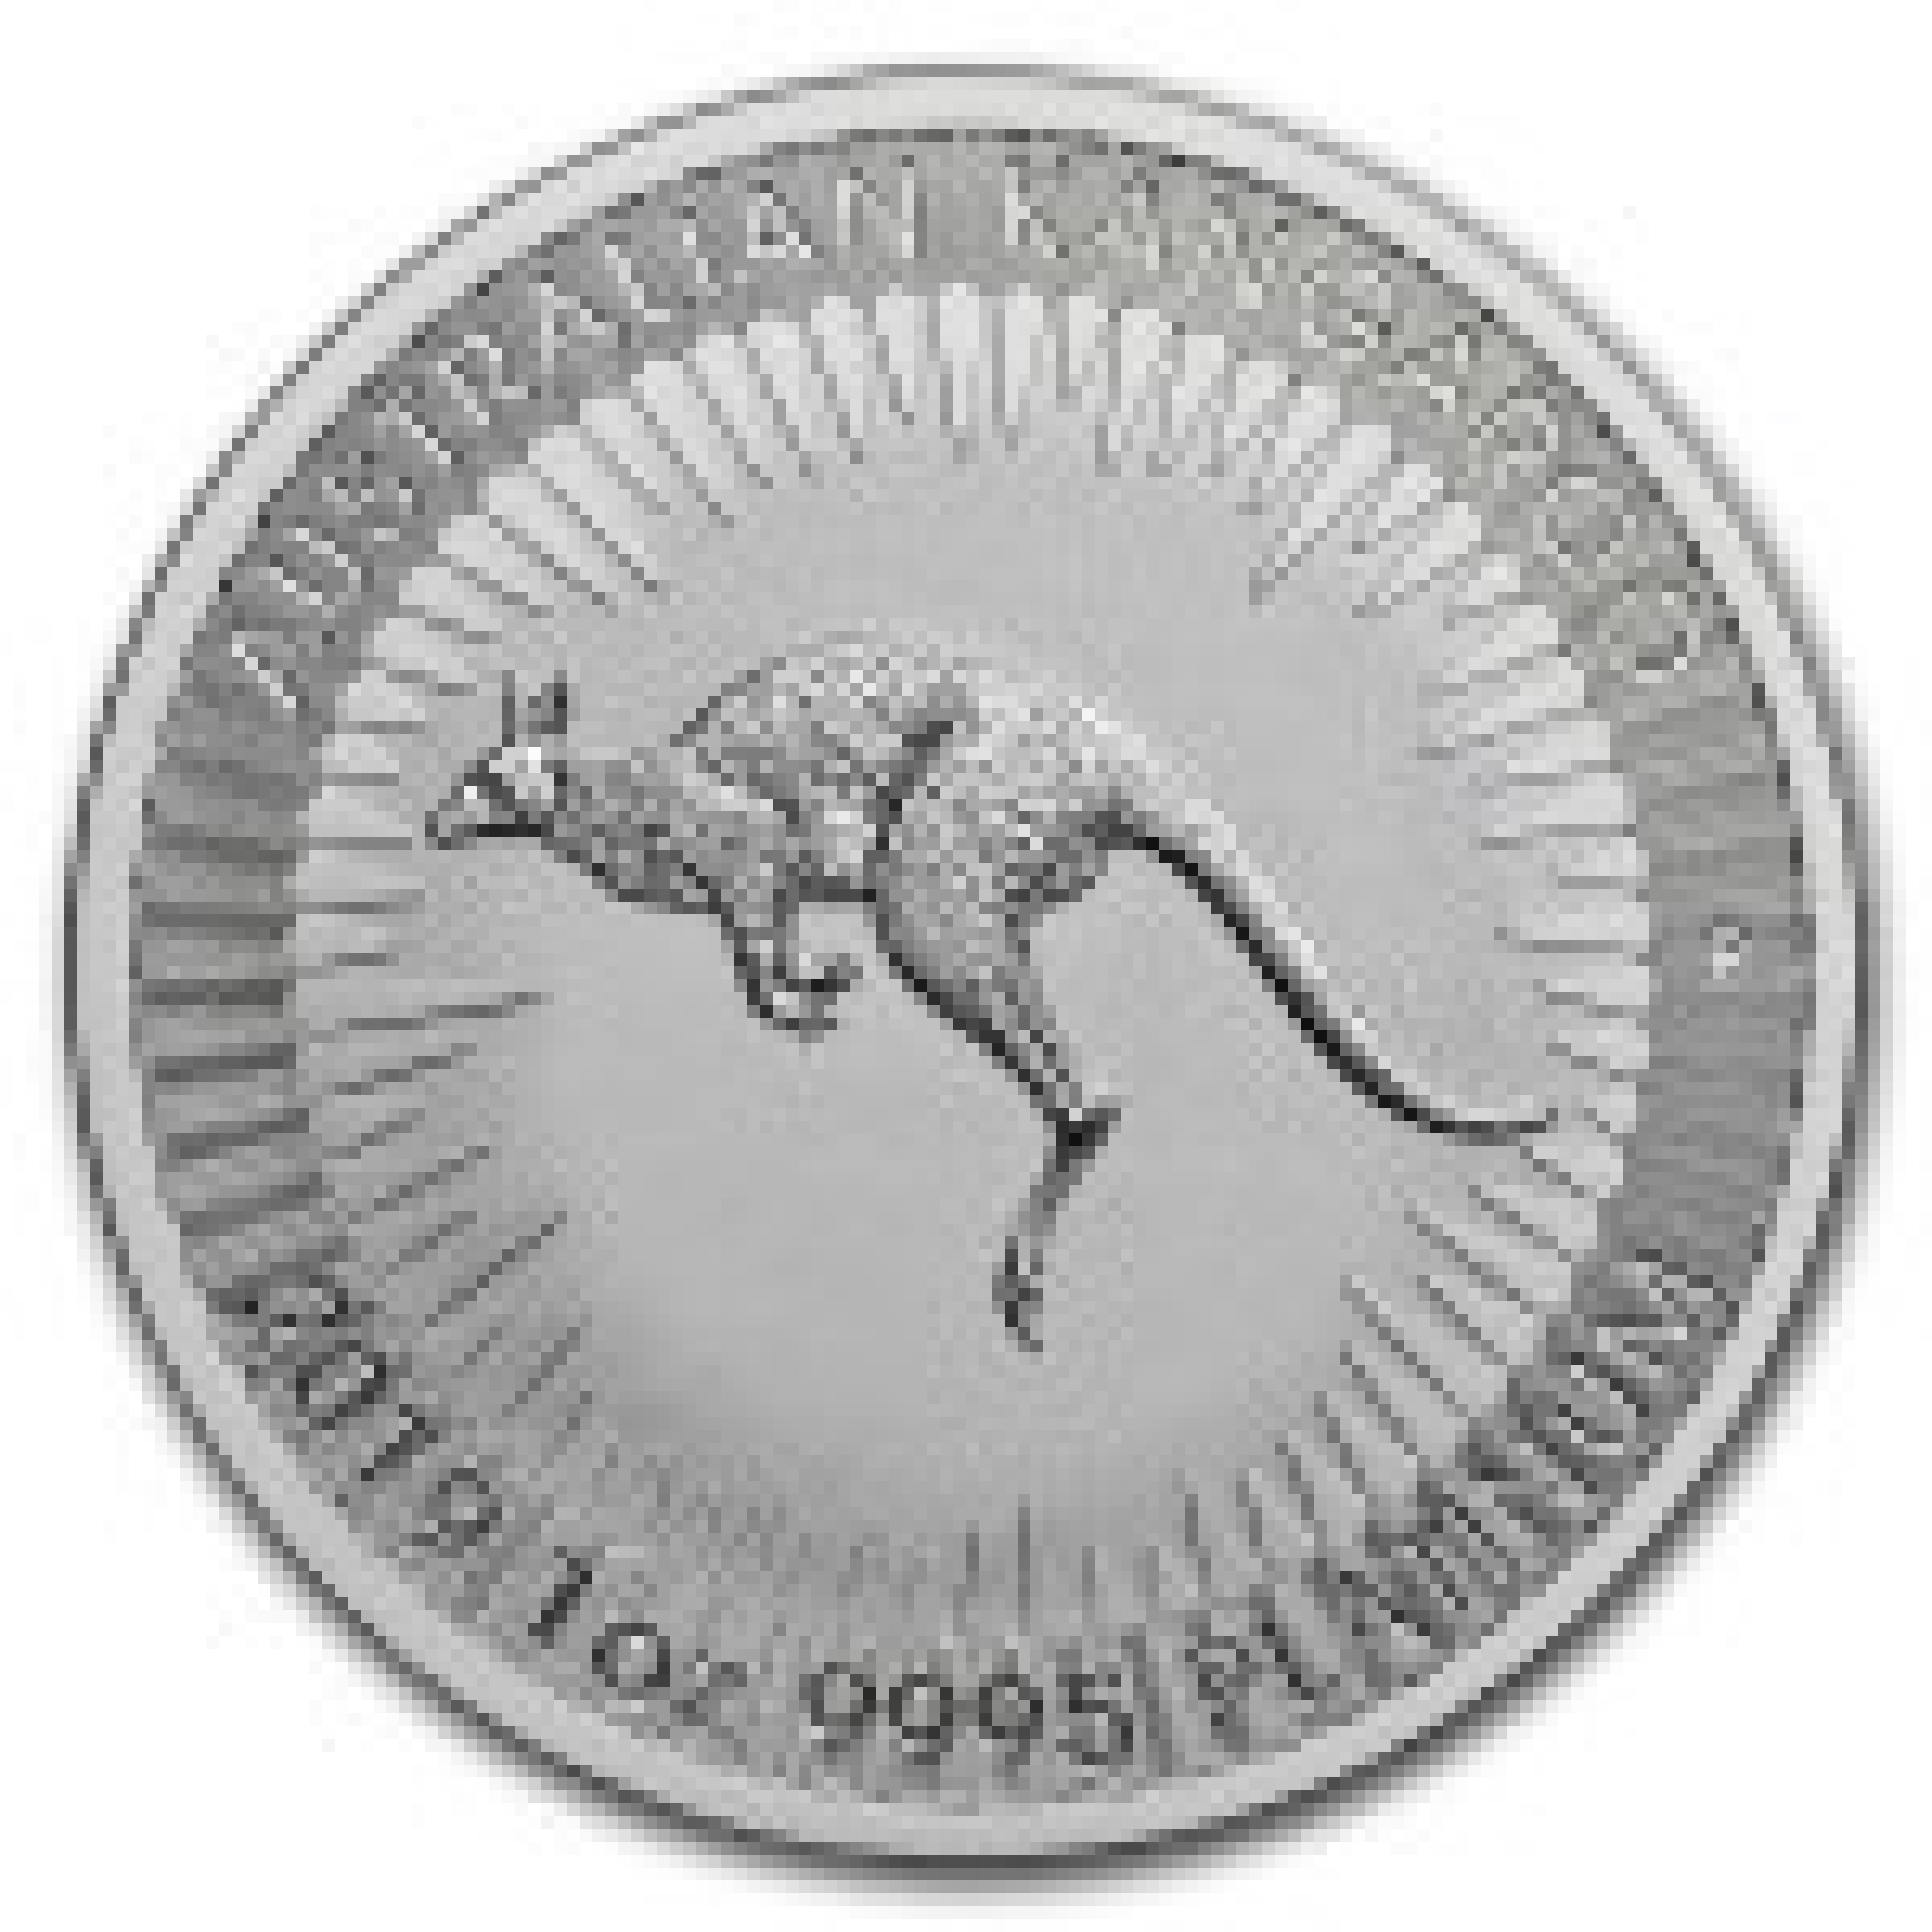 1 Troy ounce platina Kangaroo munt 2019